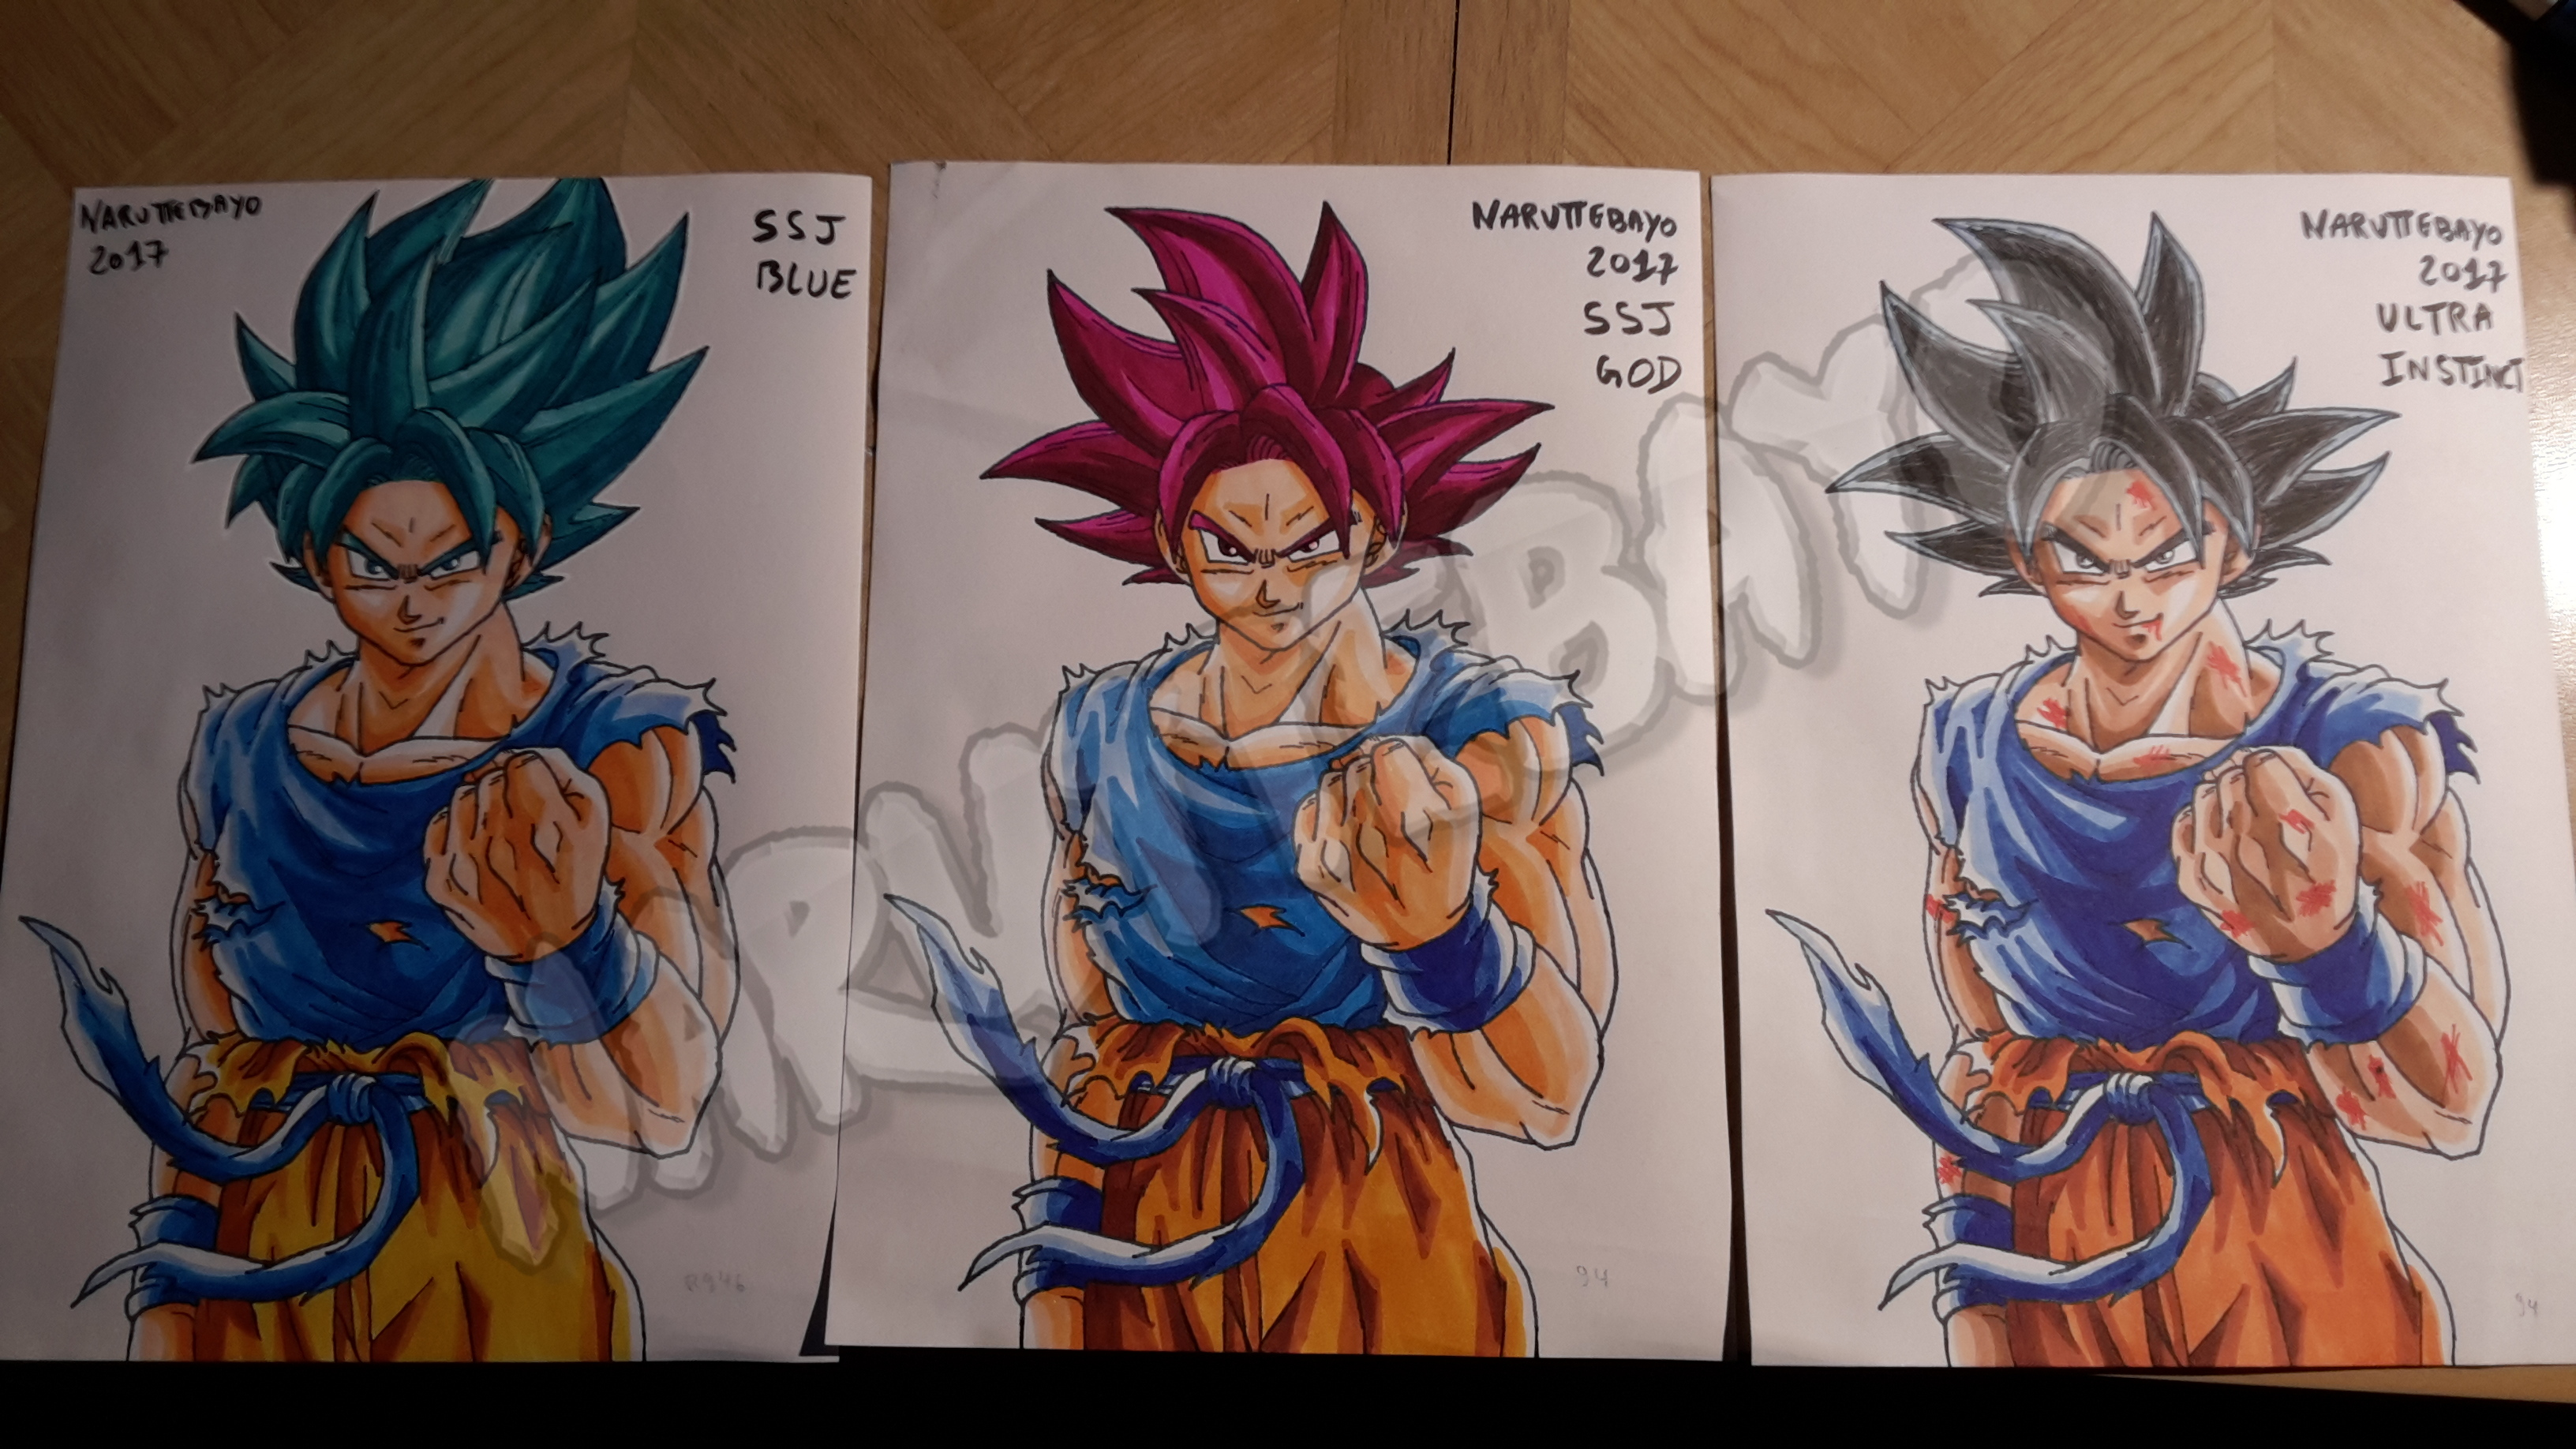 25 12 2017 Goku Blue God Ultra Instinct By Naruttebayo67 On